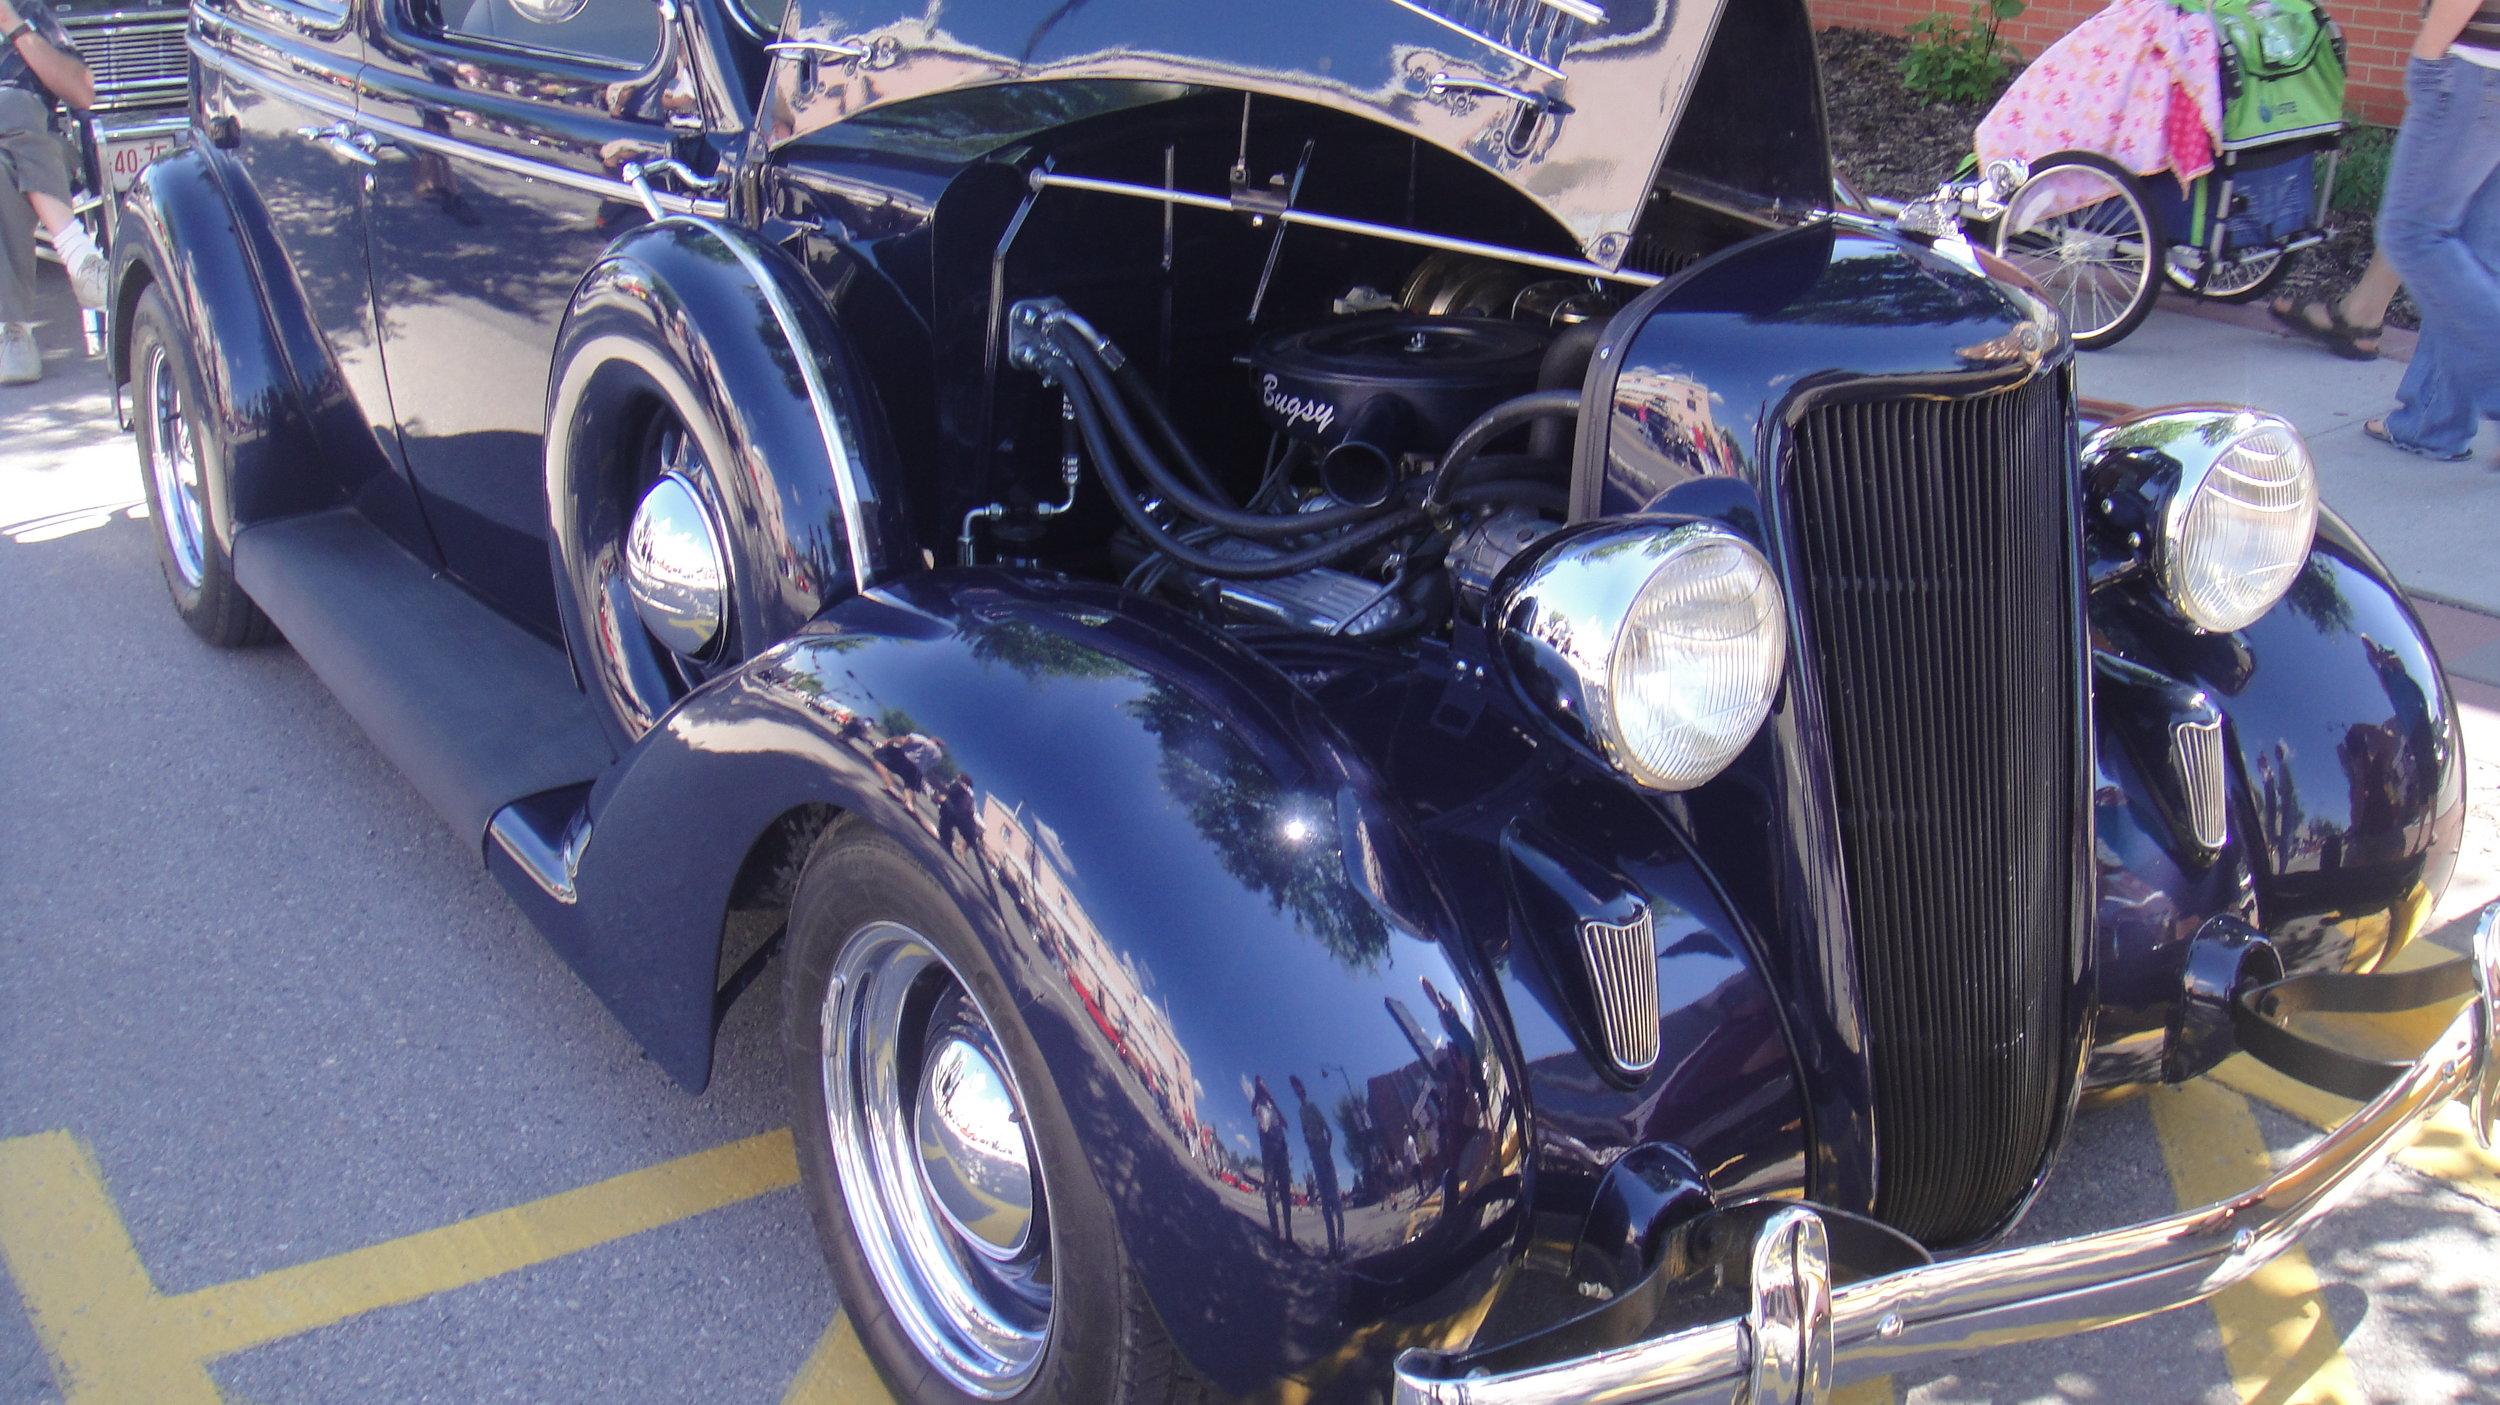 Prestige car wash auto detailing calgary aug 2010 147g prestige car wash auto detailing solutioingenieria Gallery